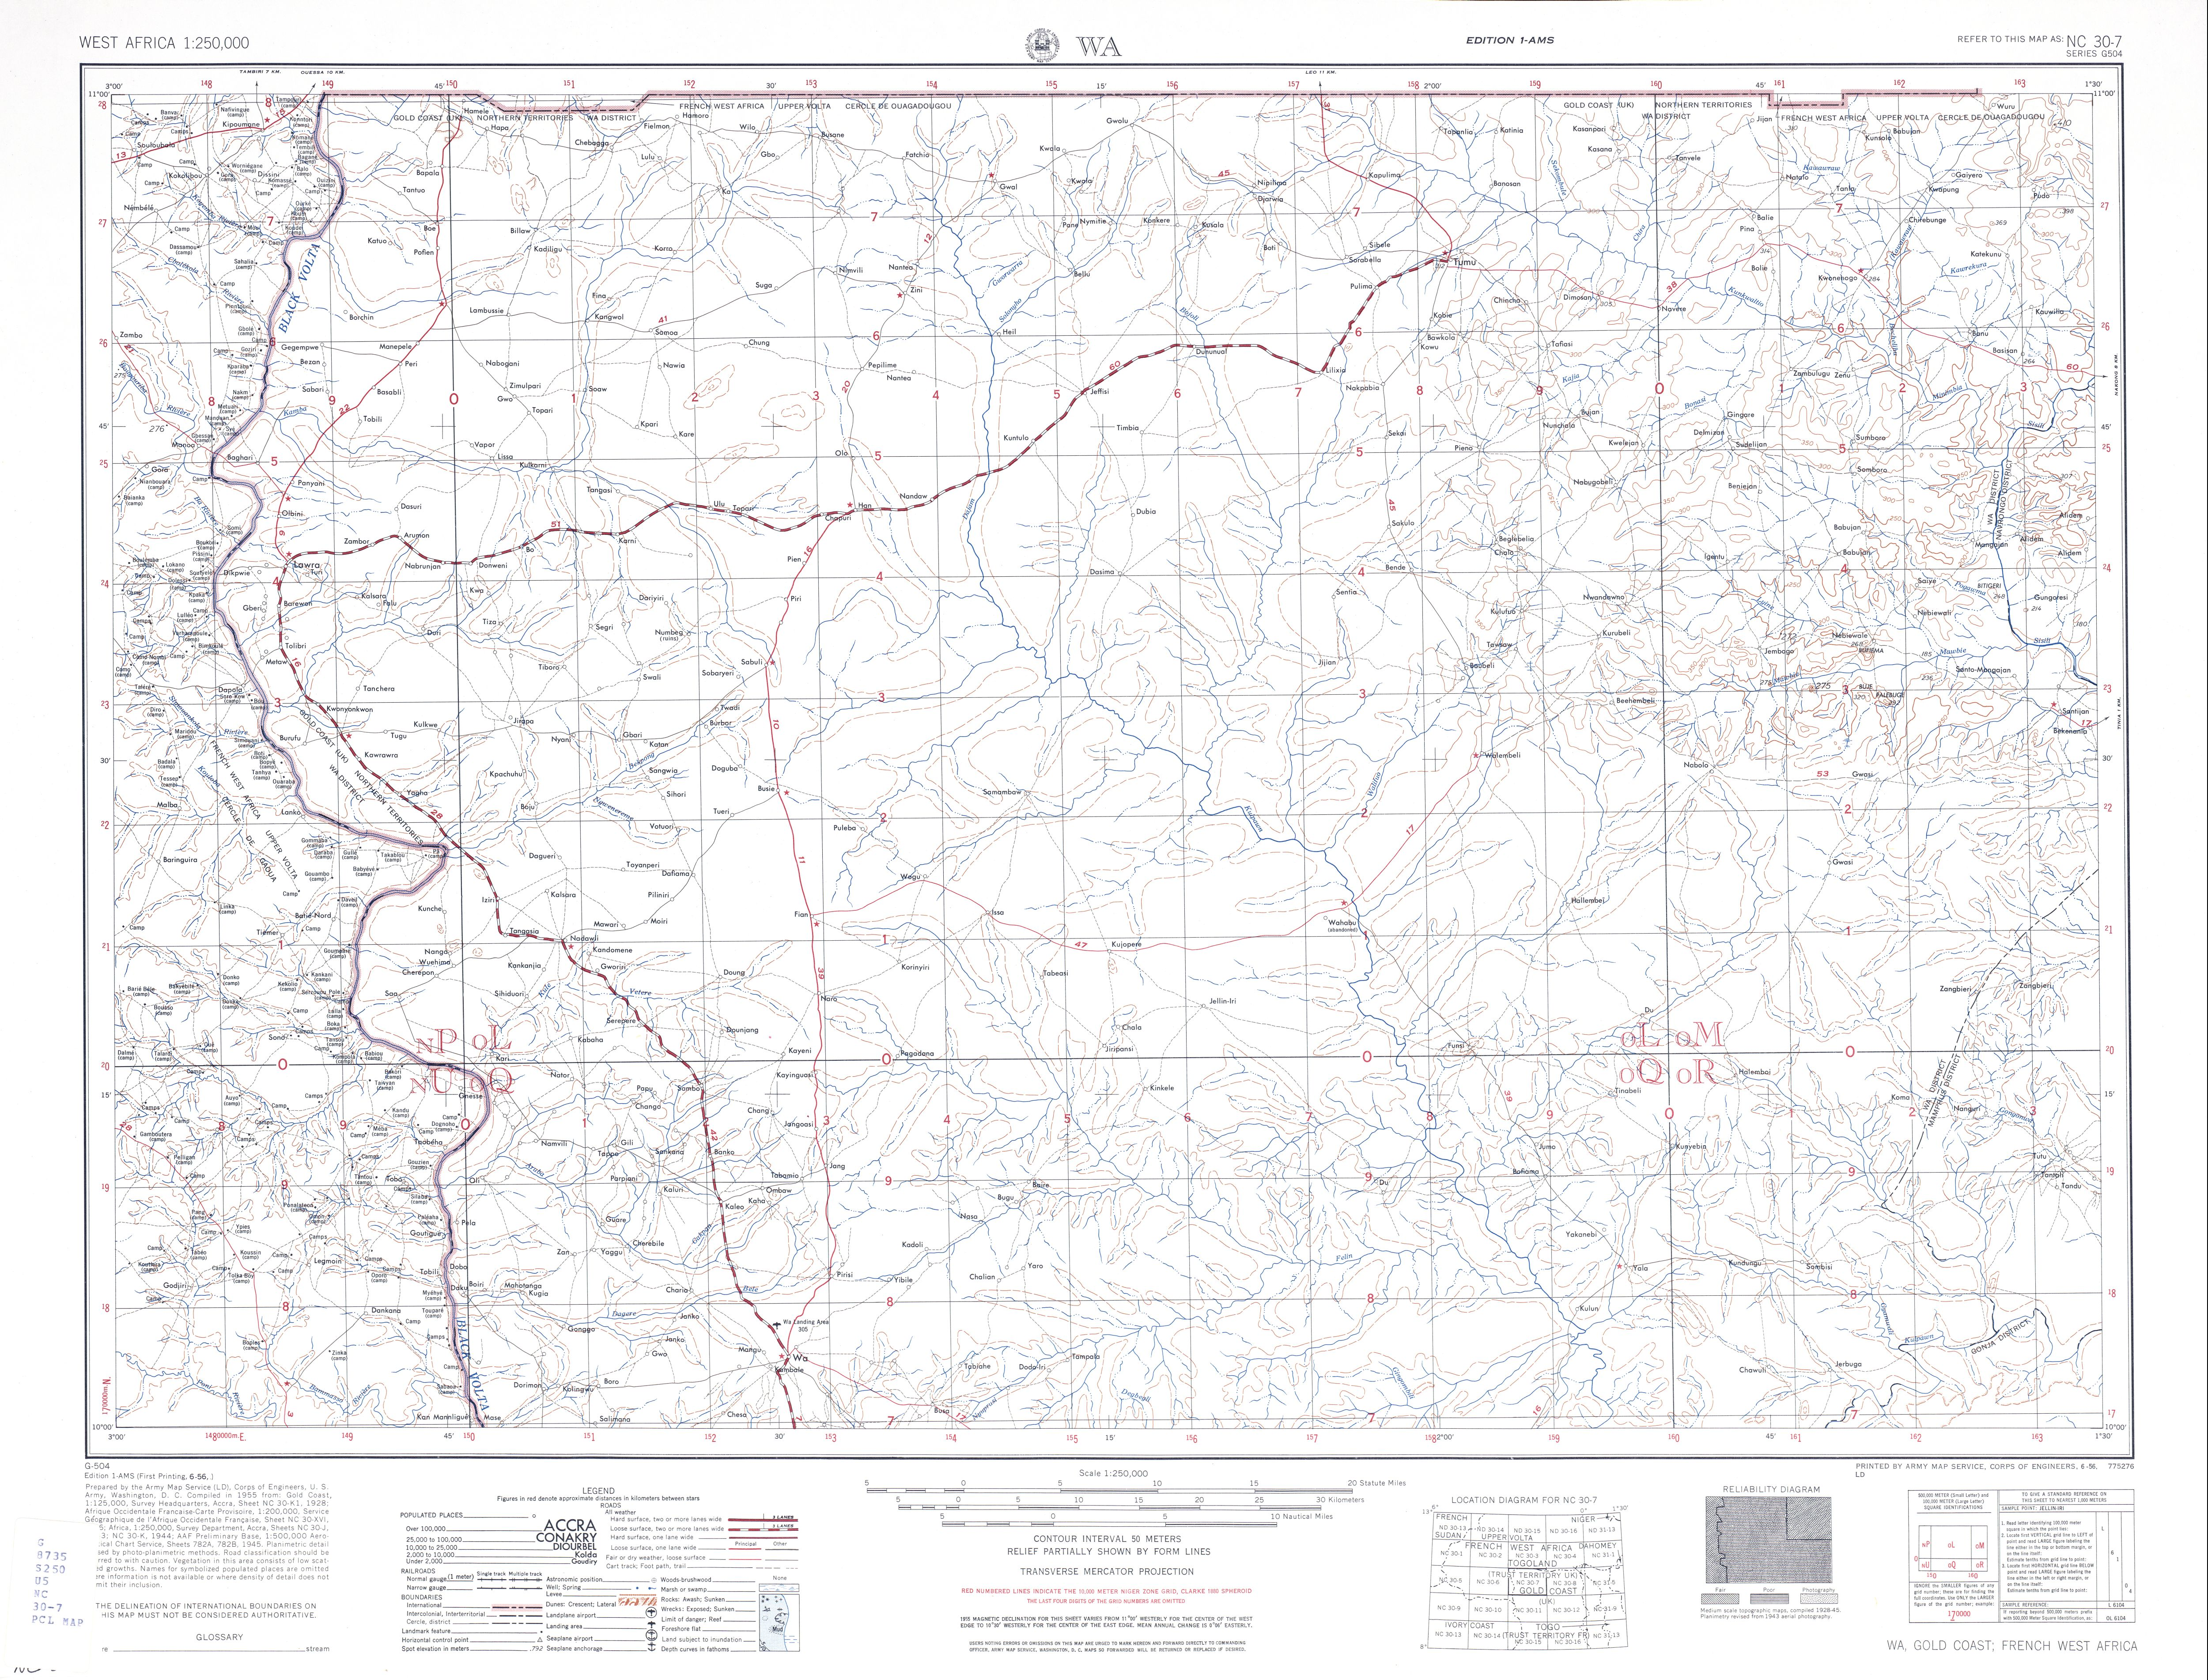 Hoja Wa del Mapa Topográfico de África Occidental 1955